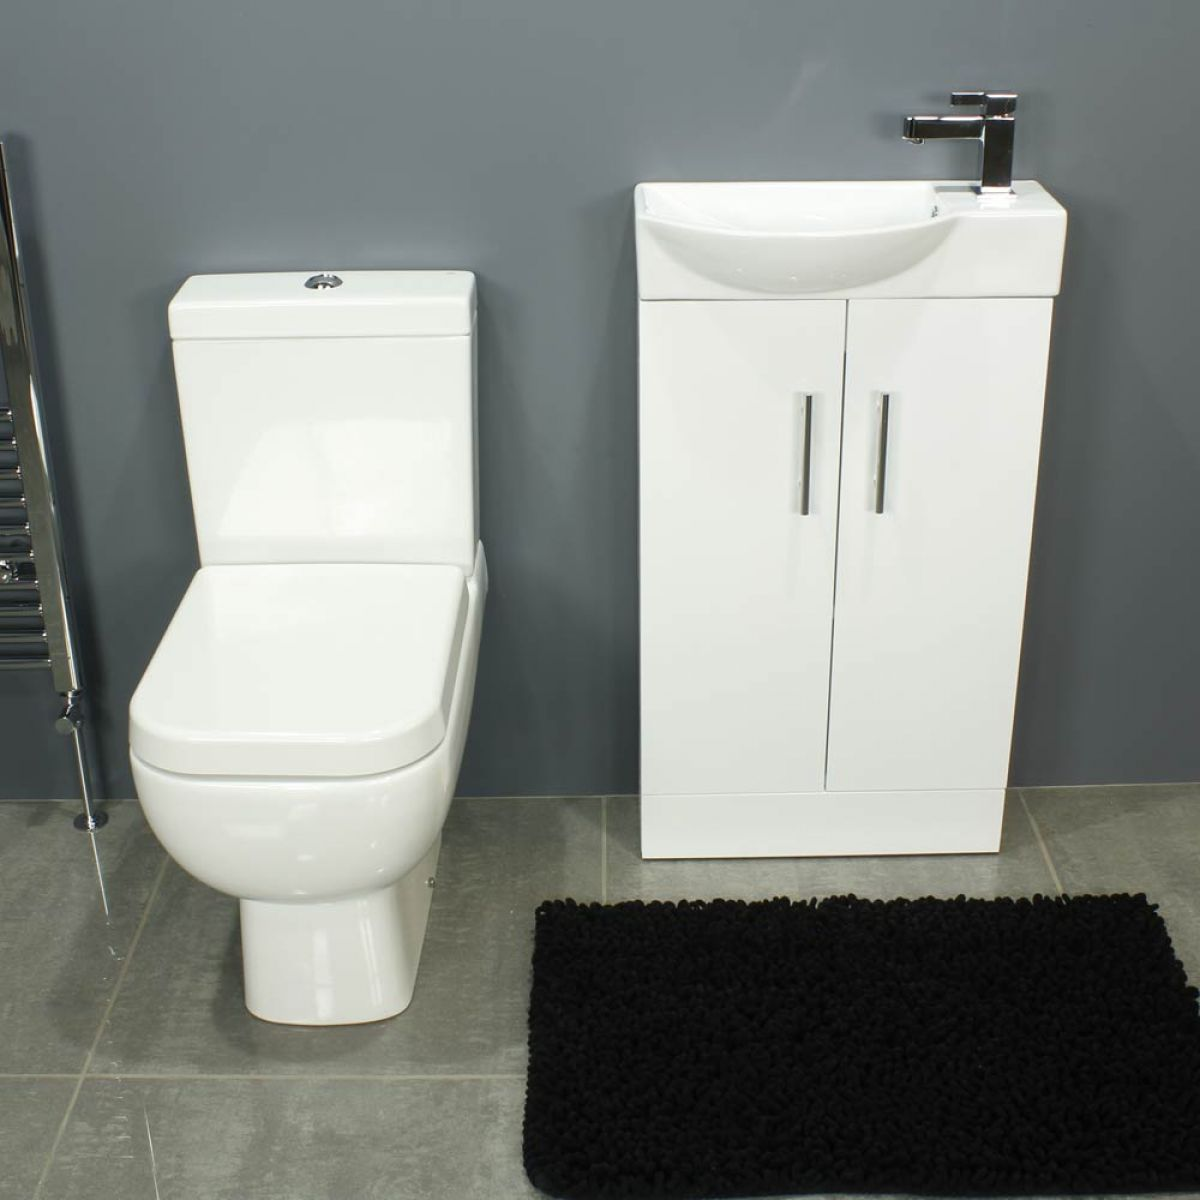 RAK Series 600 Close Coupled Toilet and 500 Series Gloss White Mini Double Door Vanity Unit Front